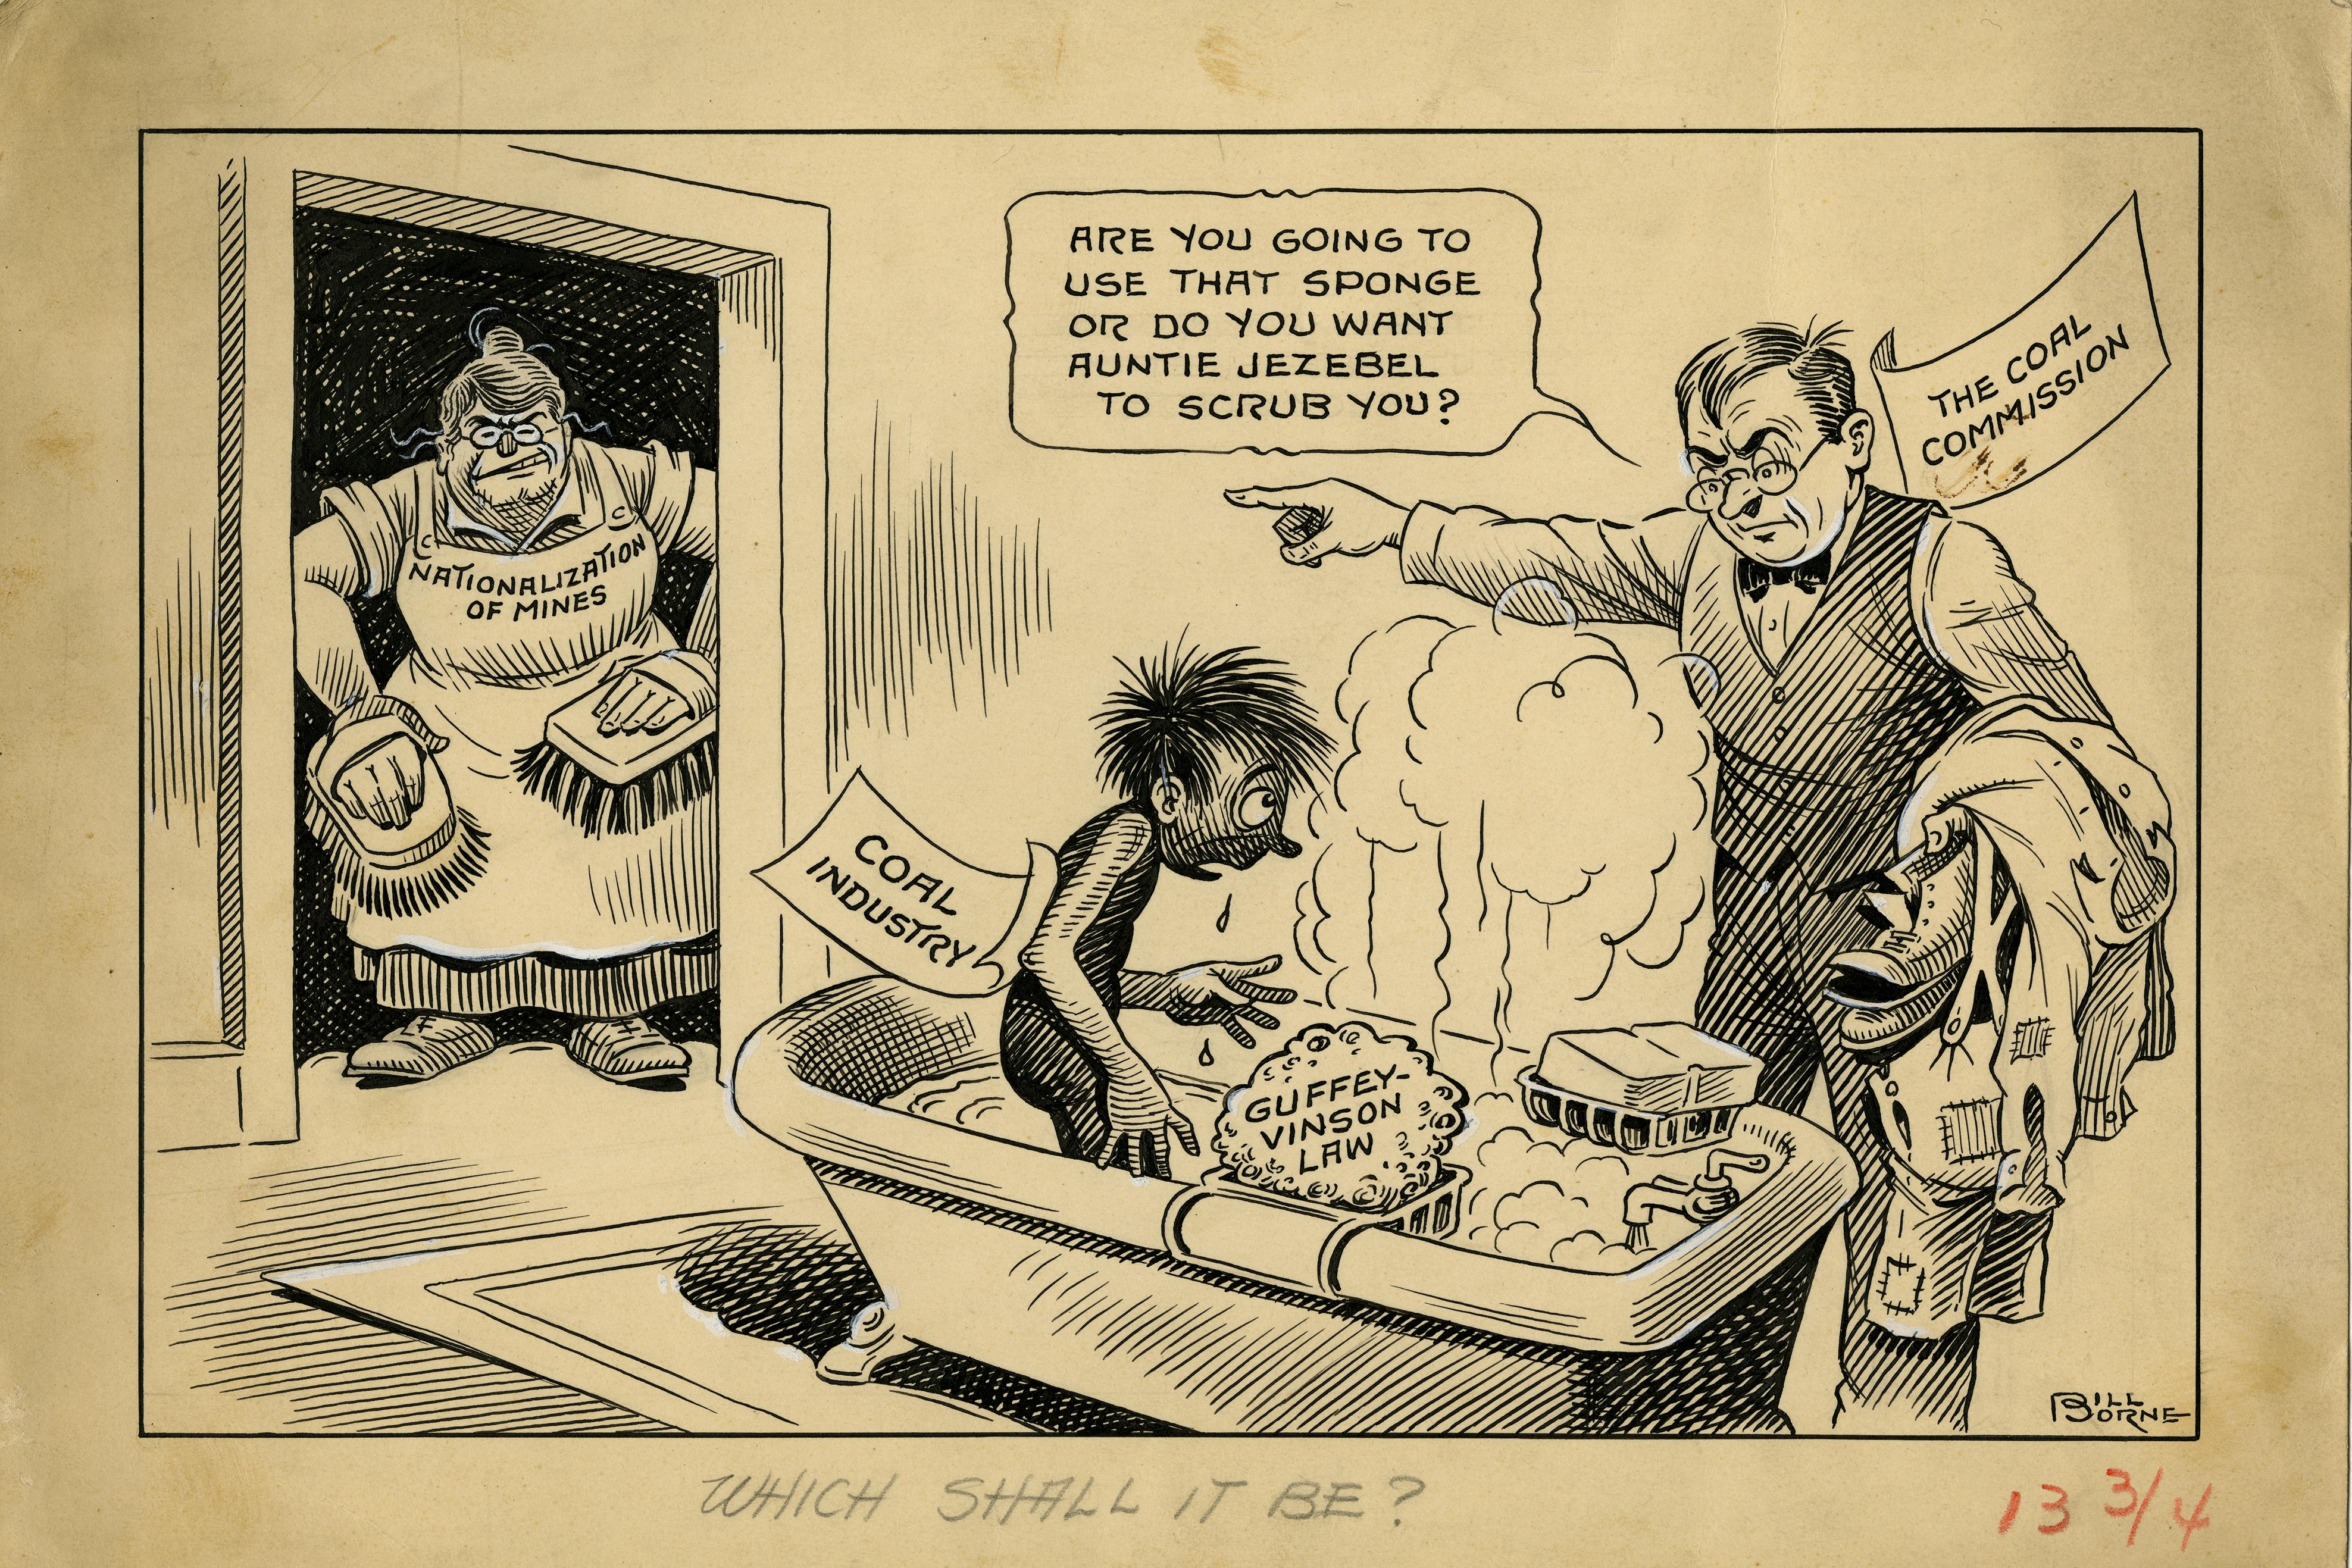 Old cartoon depicting coal companies getting a bath